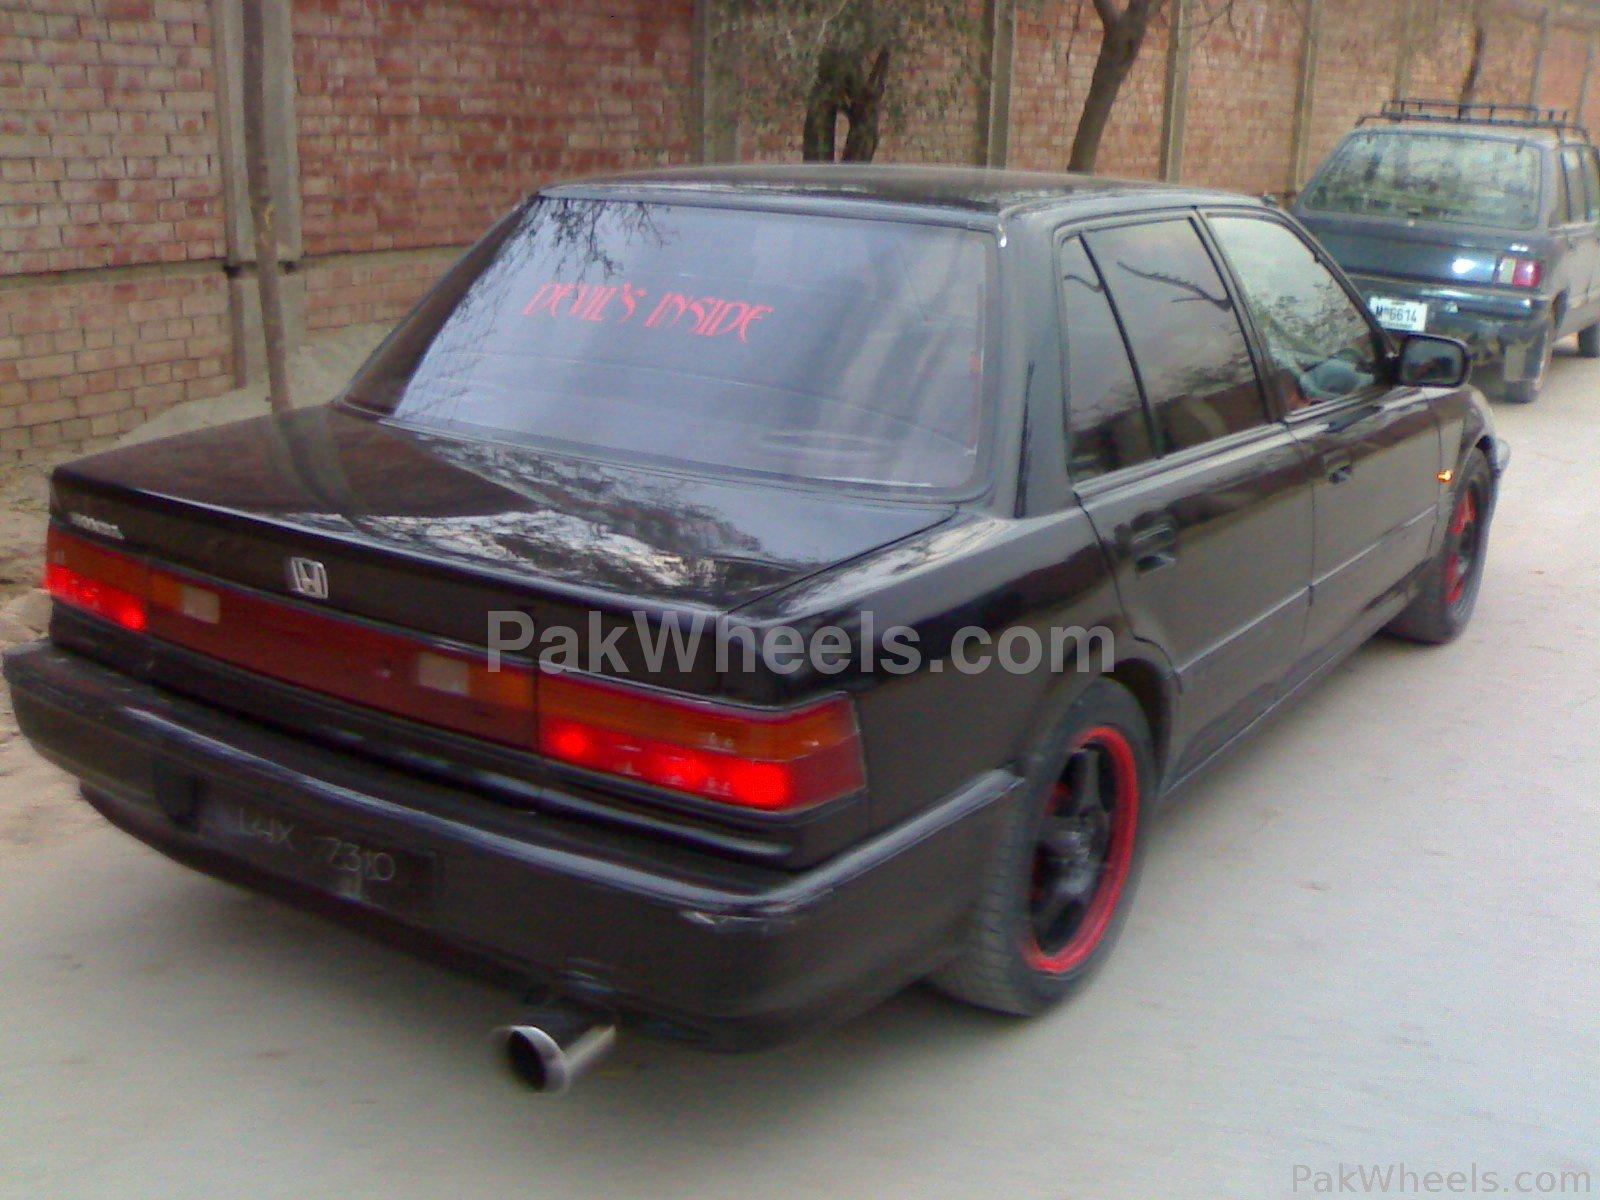 Honda civic 1988 of devil inside member ride 13208 for Honda civic 1988